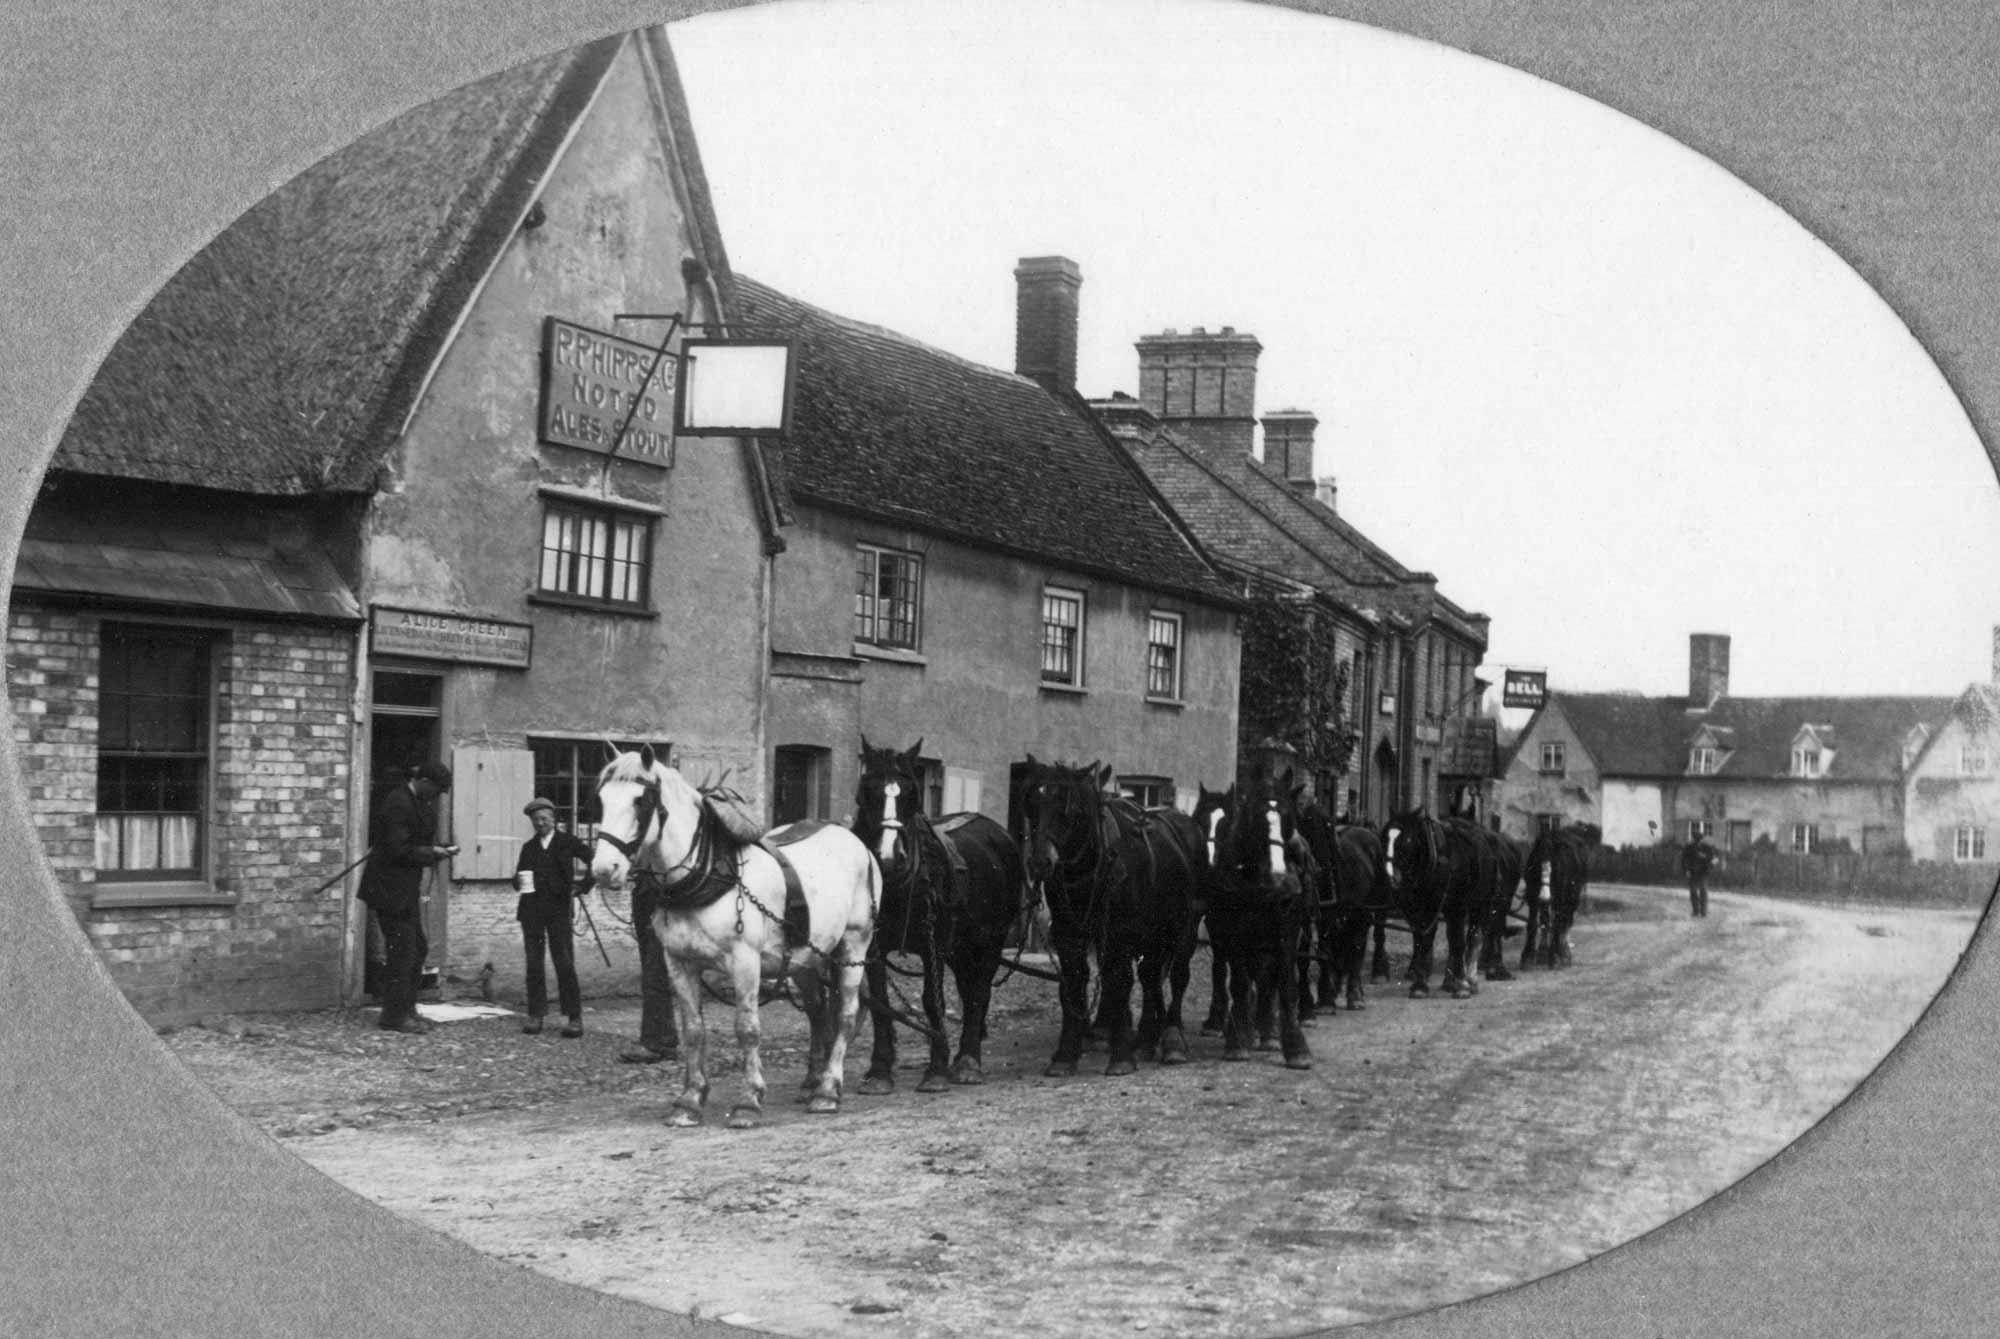 Spaldwick history